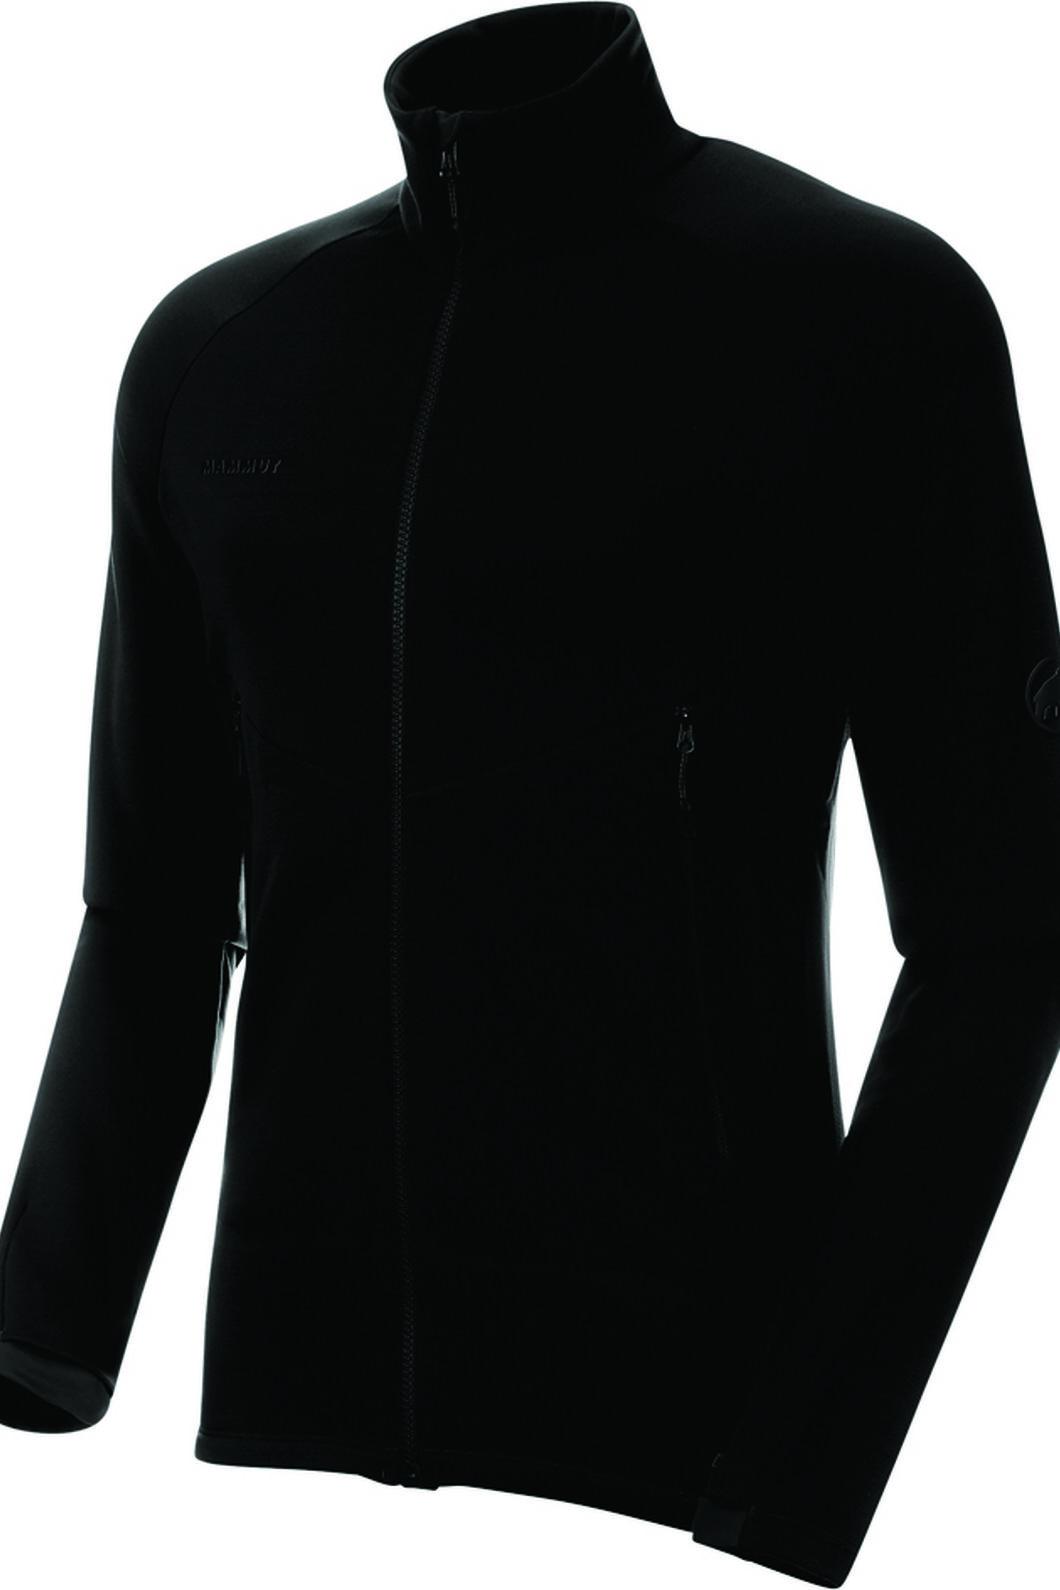 Mammut Aconcagua Mid Layer Jacket - Men's, Black, hi-res